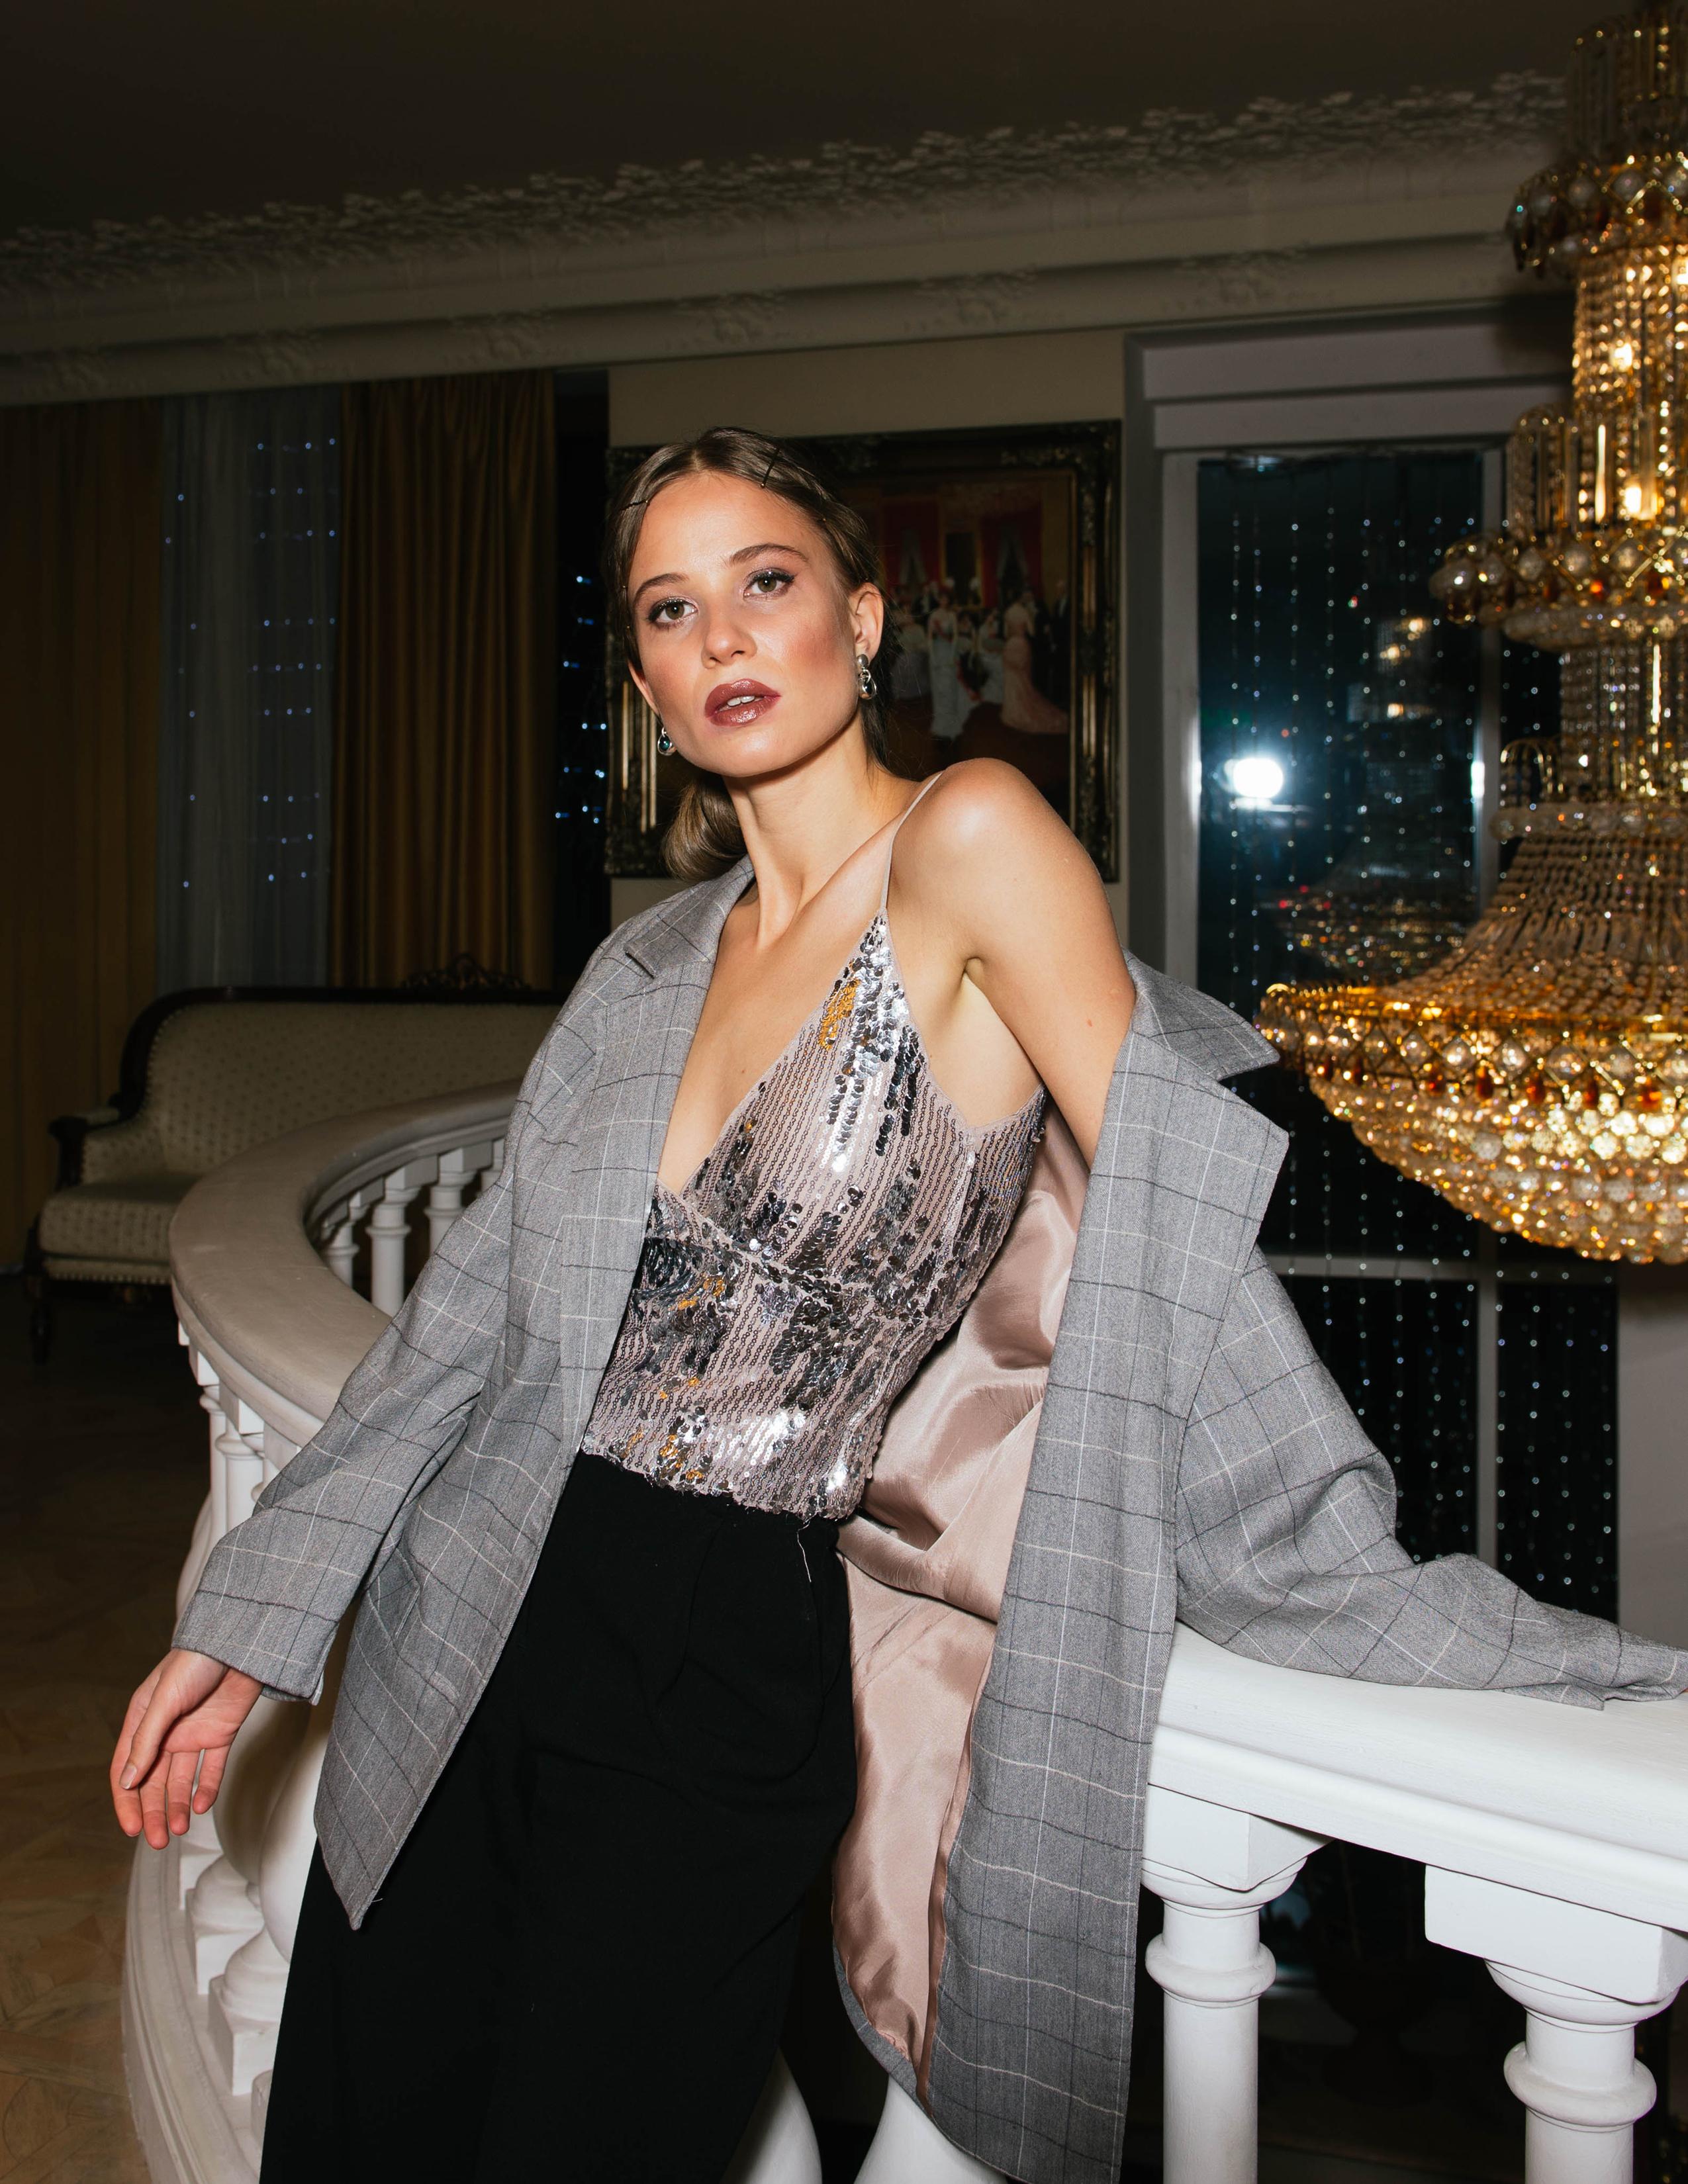 Modic Fashion Editorial - Before The Night by Elizaveta Khlebnikova